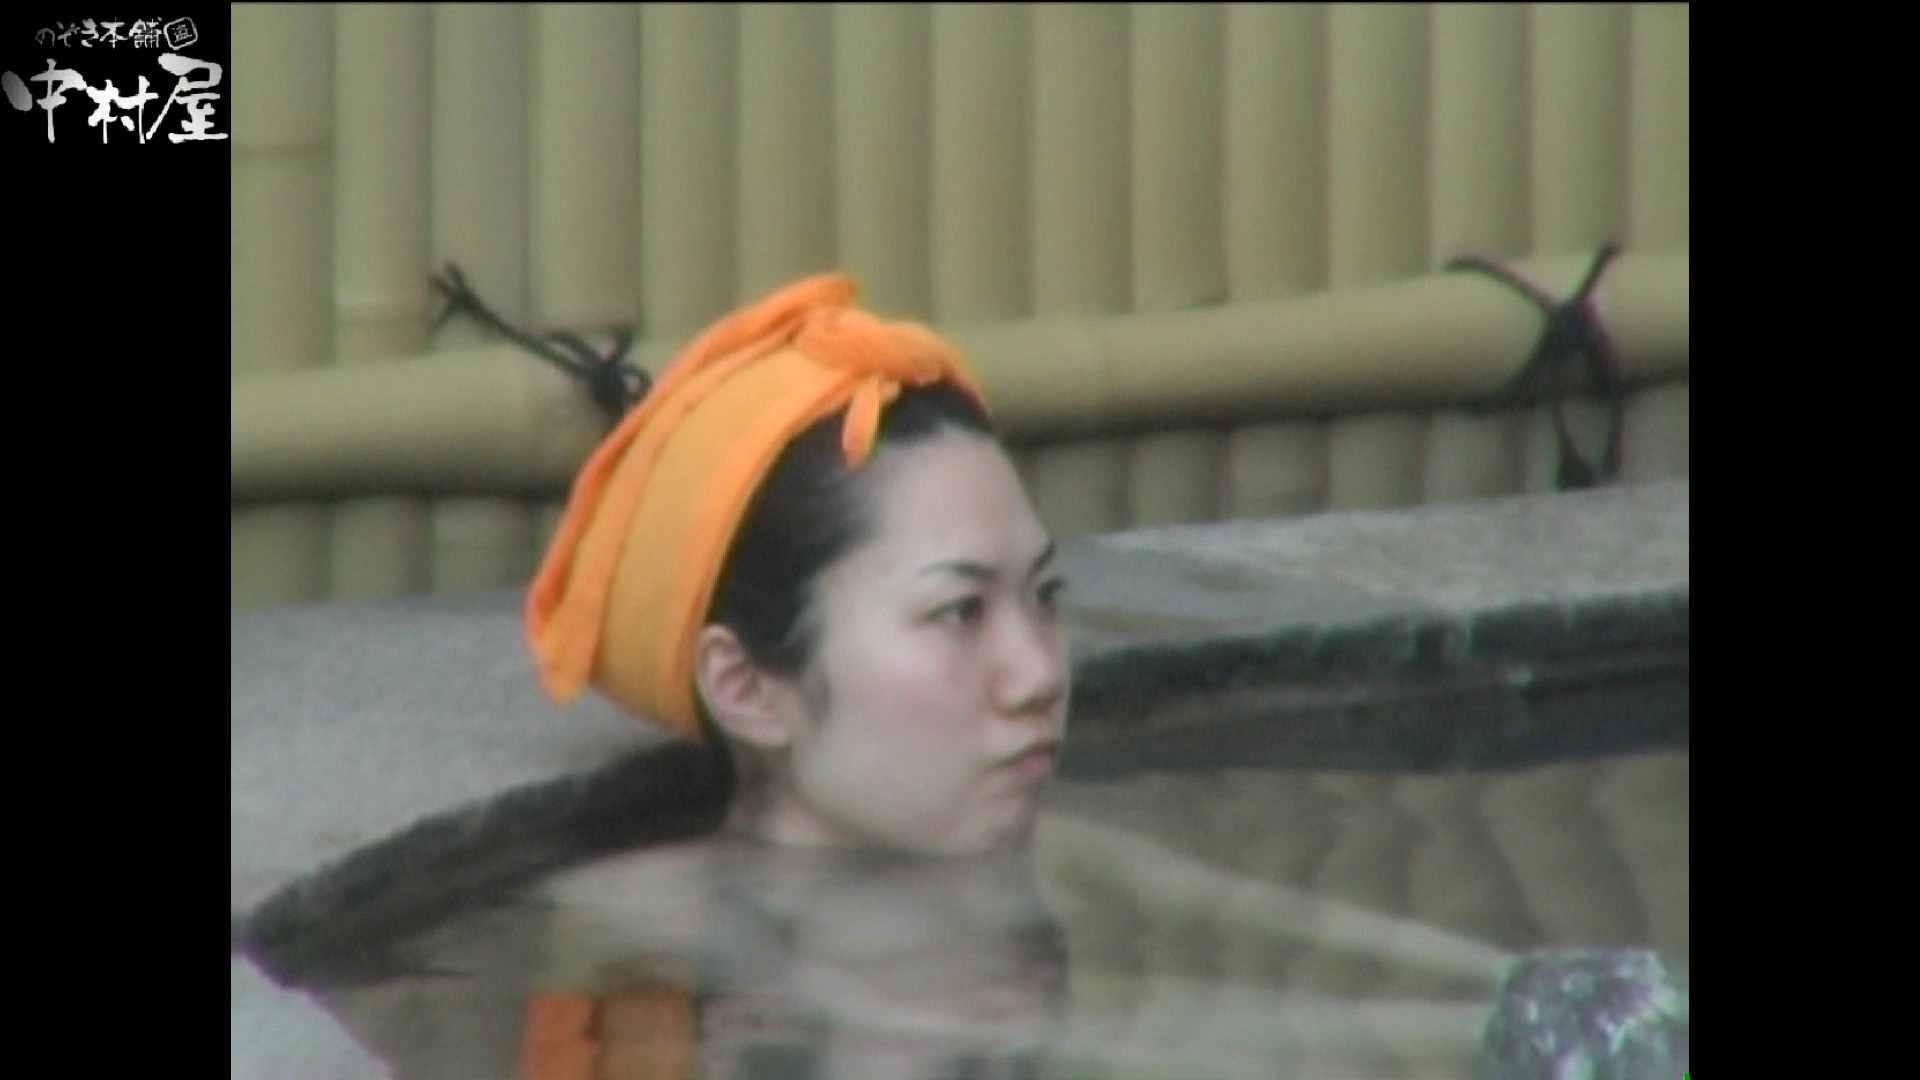 Aquaな露天風呂Vol.978 OL女体  88連発 24